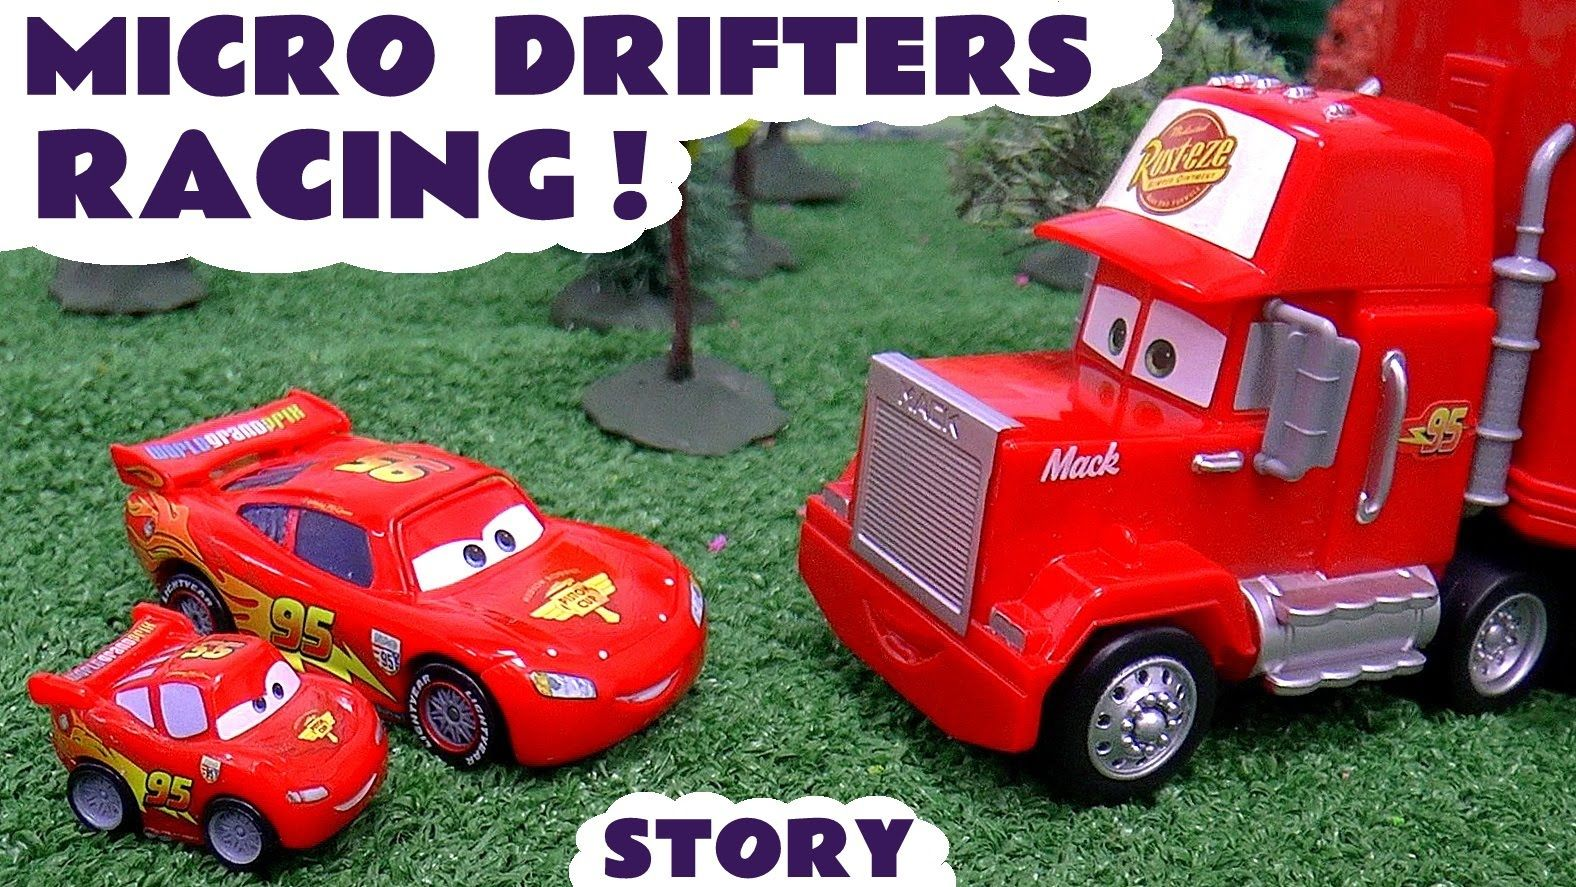 Disney Cars Lightning Mcqueen And Avengers Micro Drifters Racing Story Juguetes De Pixar Cars Pixar Cars Disney Cars Disney Cars Toys